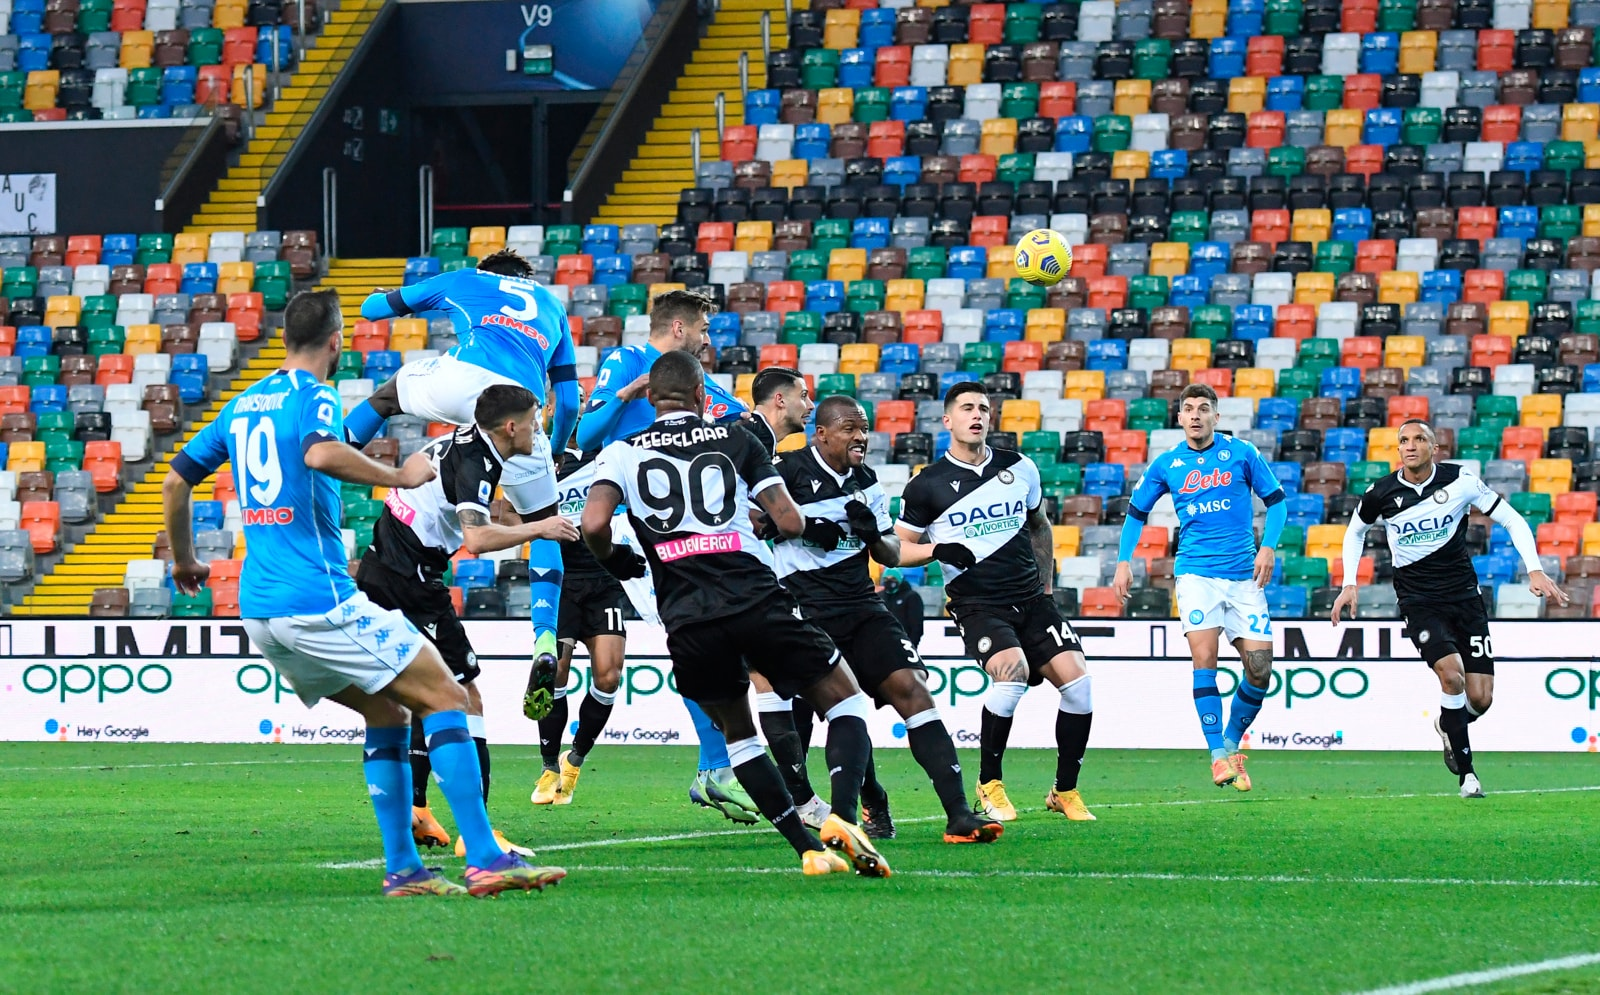 Bakayoko salva Gattuso al 90': il Napoli batte l'Udinese 2-1